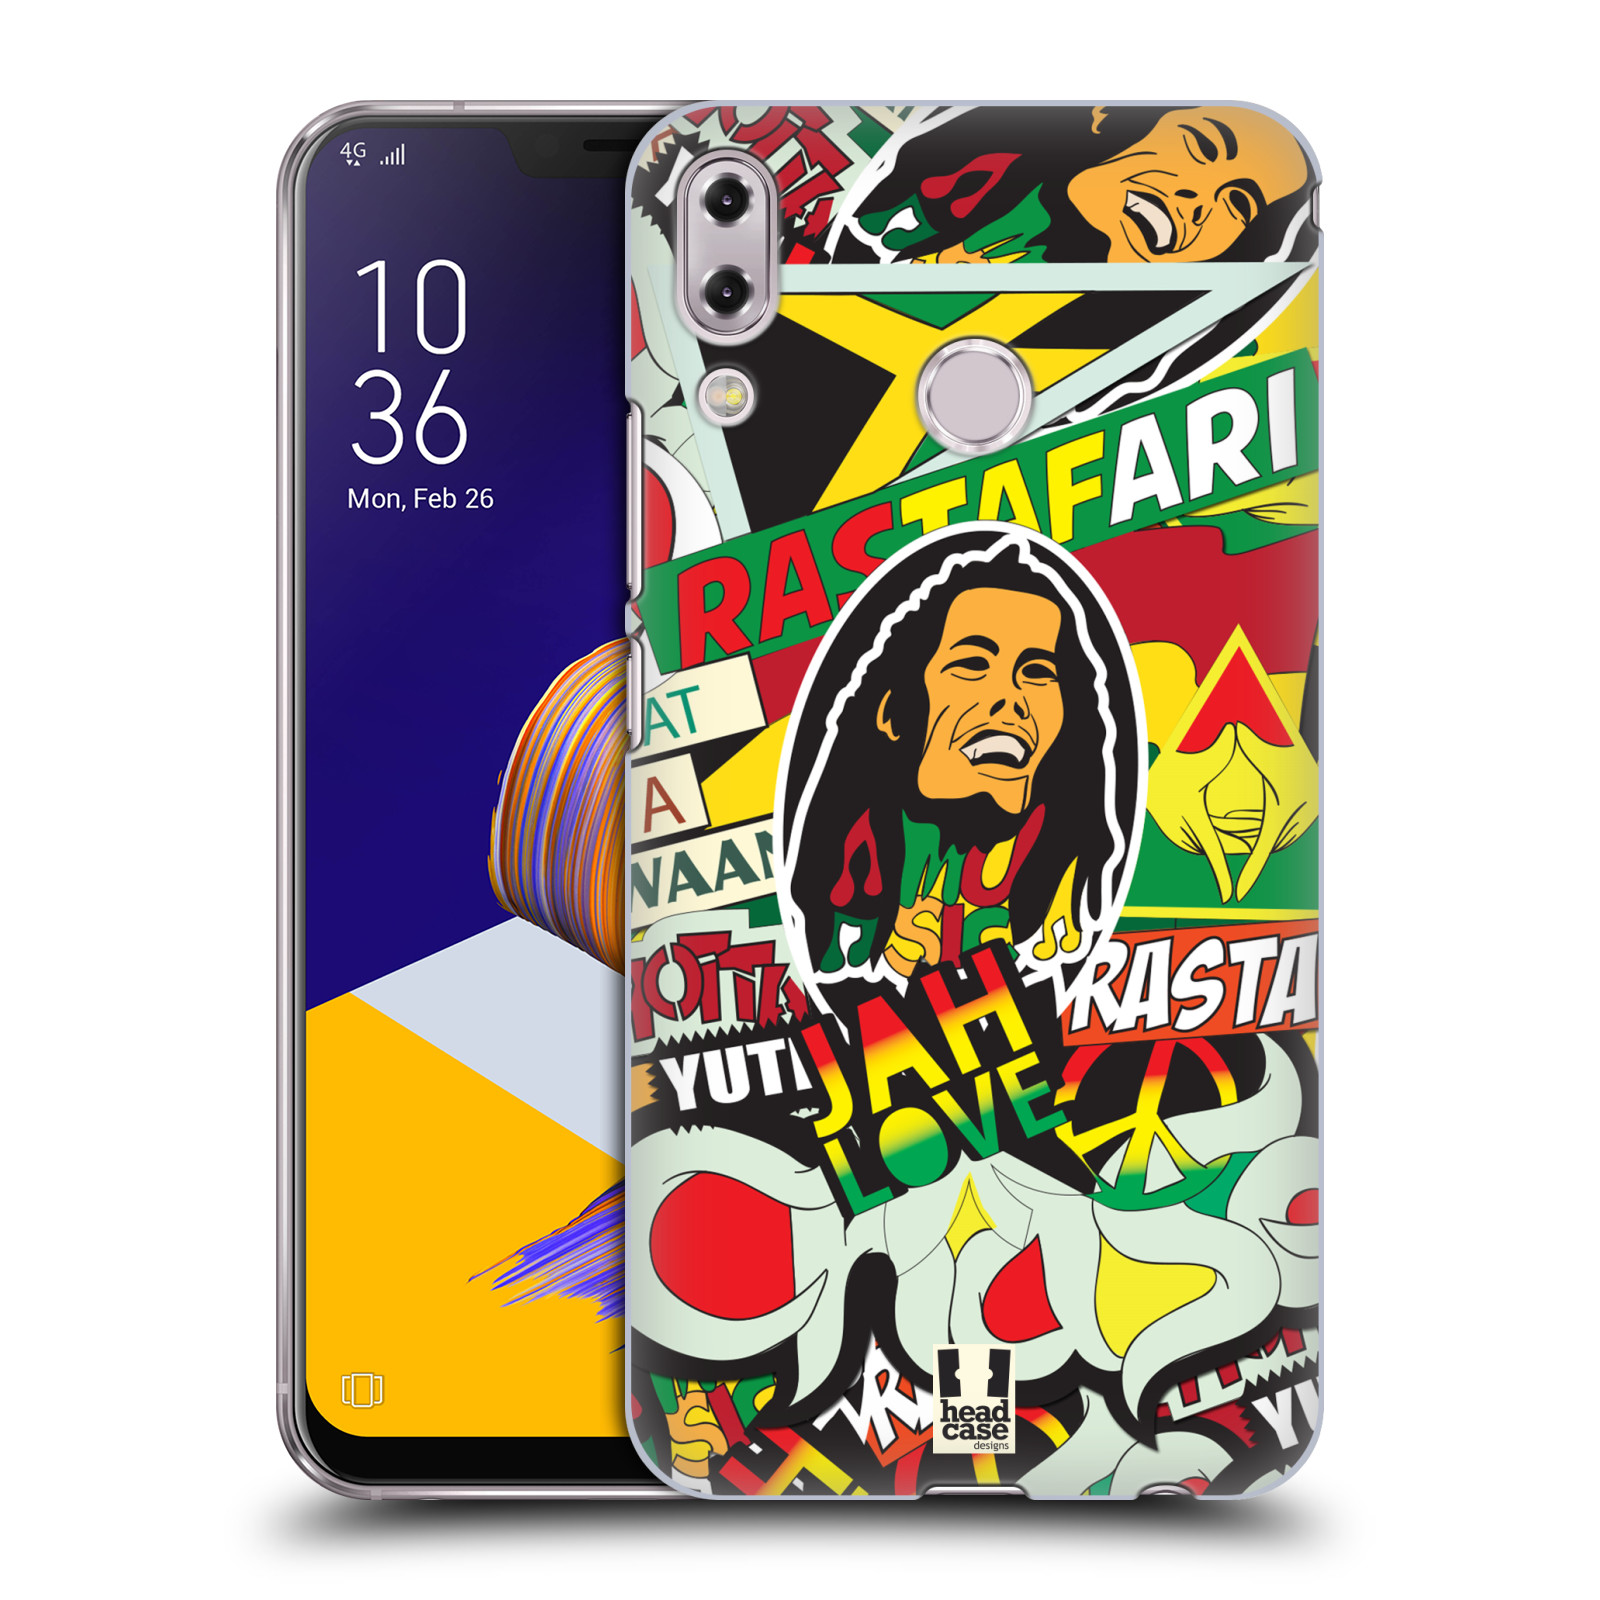 Plastové pouzdro na mobil Asus Zenfone 5z ZS620KL - Head Case - RASTA (Plastový kryt či obal na mobilní telefon Asus Zenfone 5z (ZS620KL) s motivem RASTA )